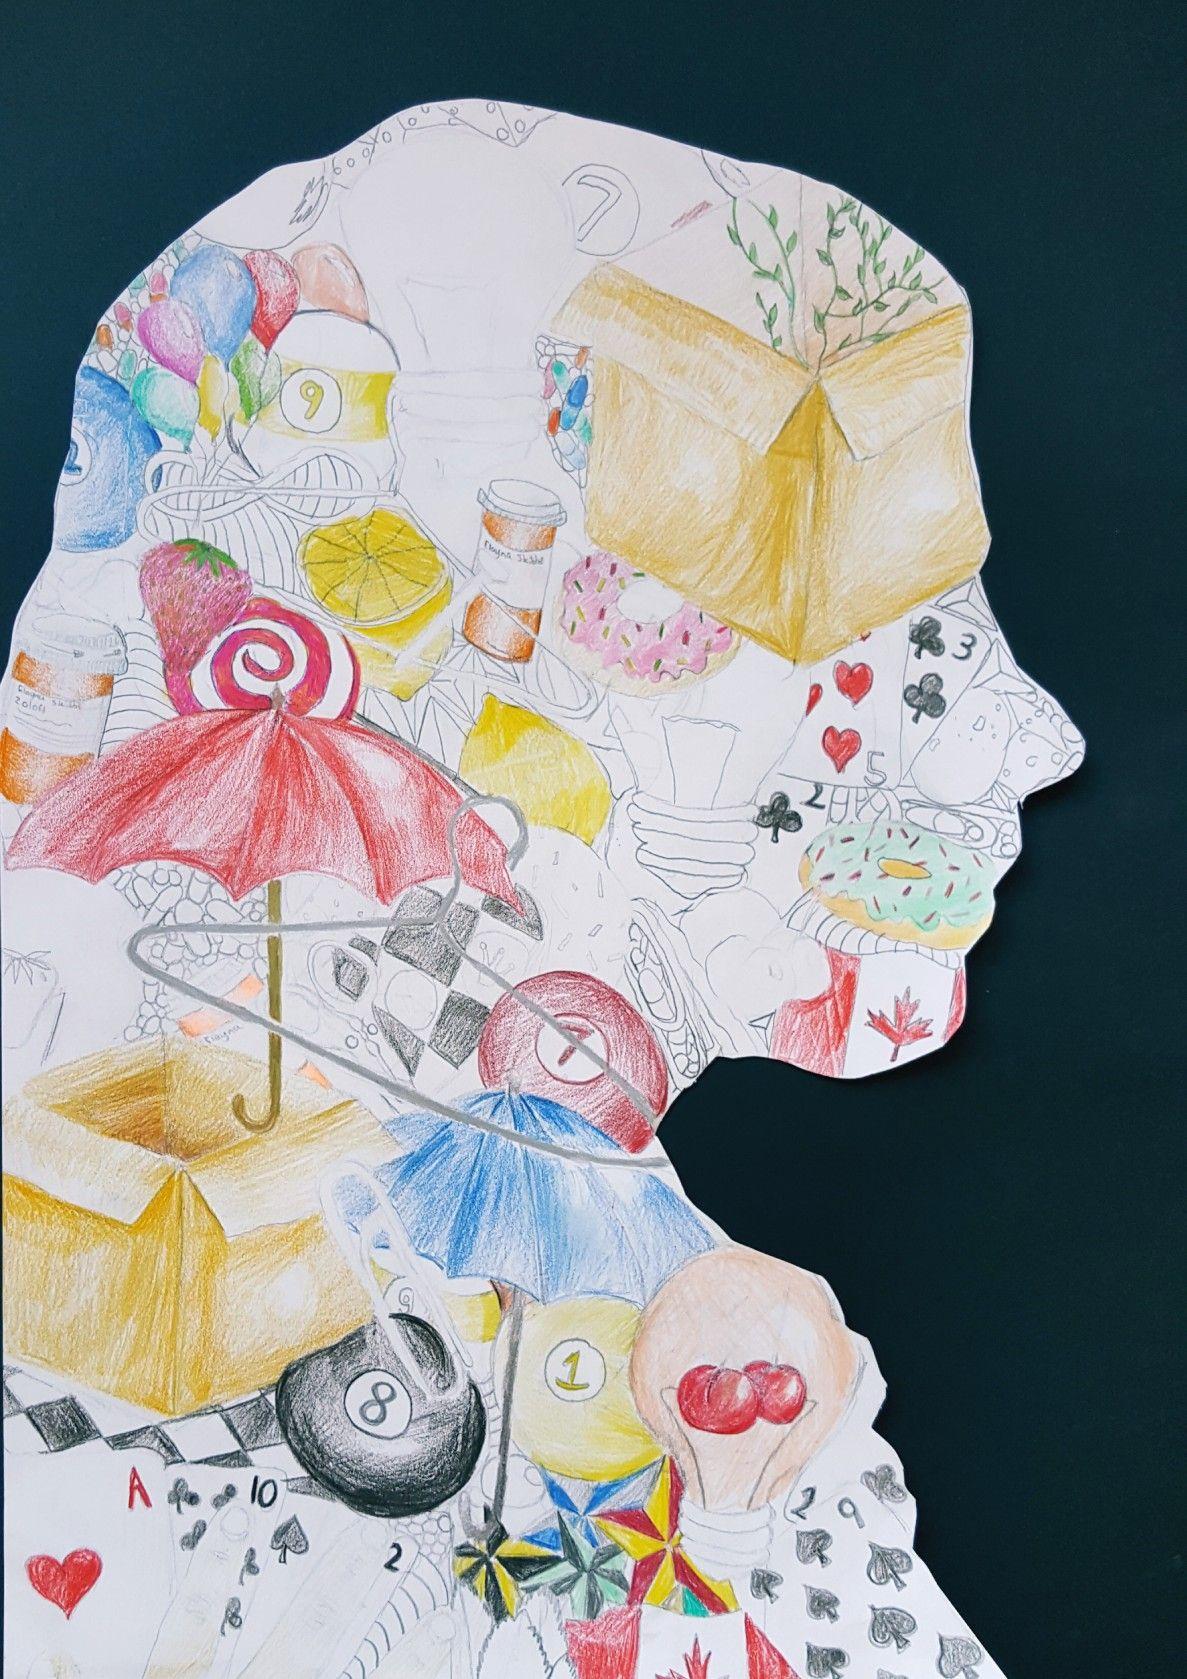 Personalized Silhouettes 7th Grade Art Ed Central